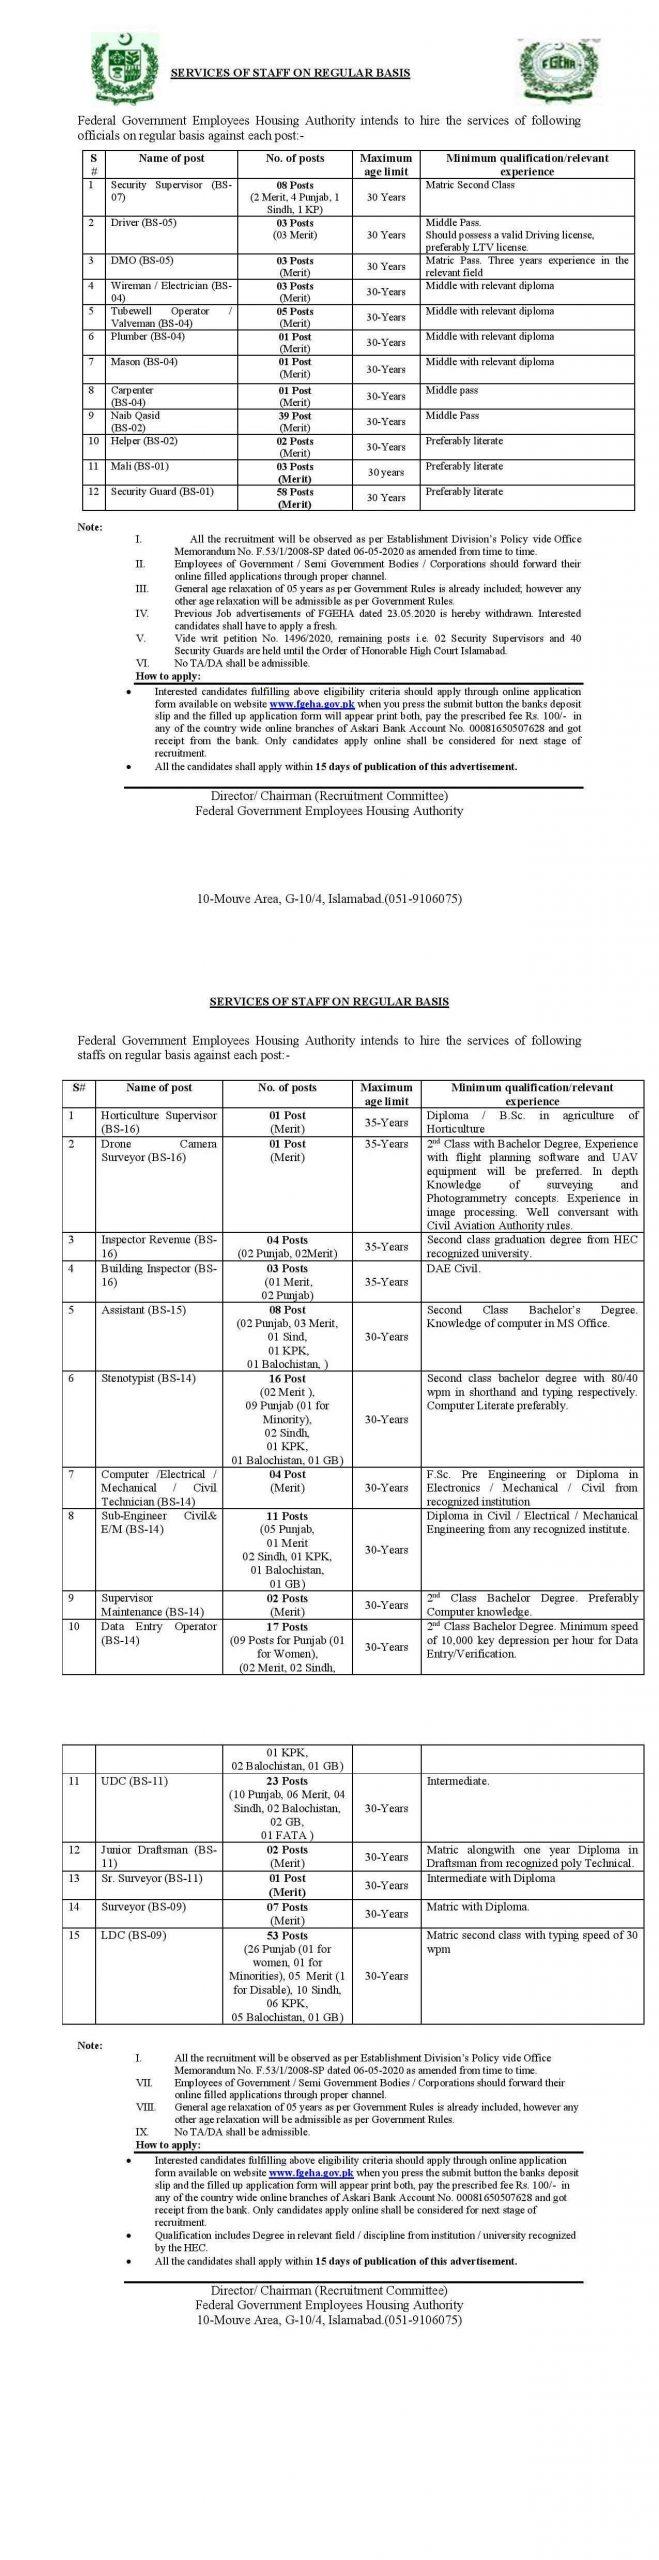 Federal Government Employees Housing Authority FGEHA Jobs | Jobs 2021 | www.merenukkri.com